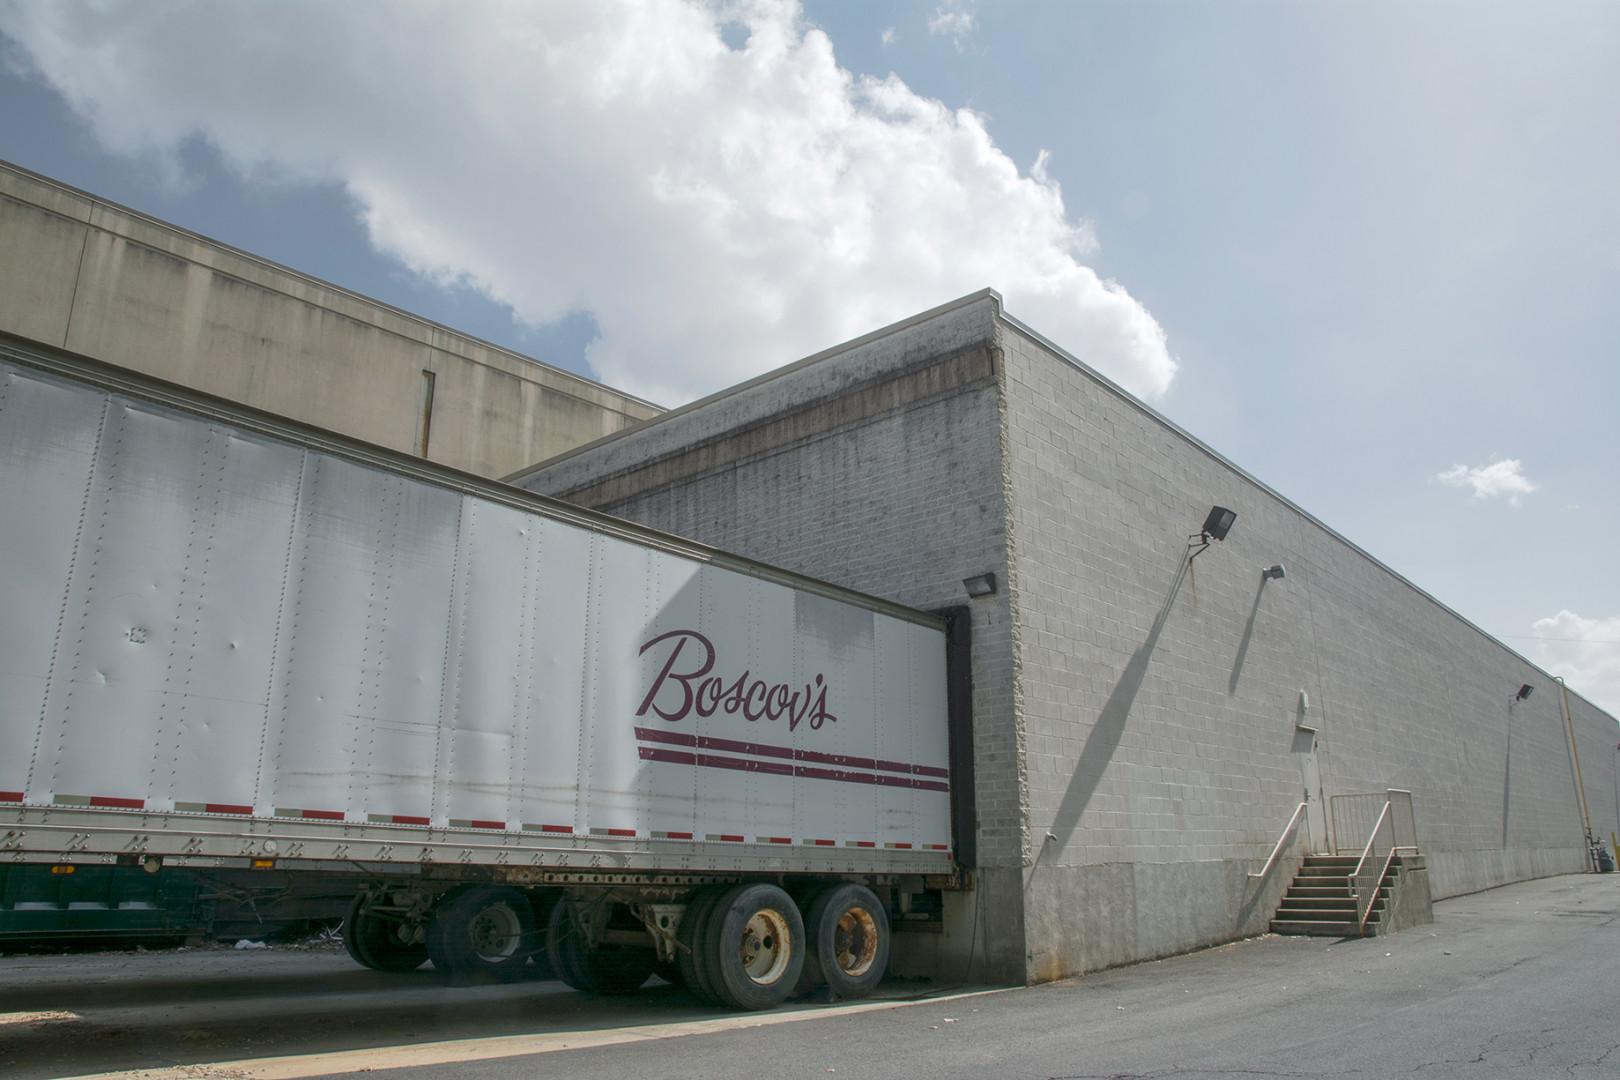 A Boscov truck unloading